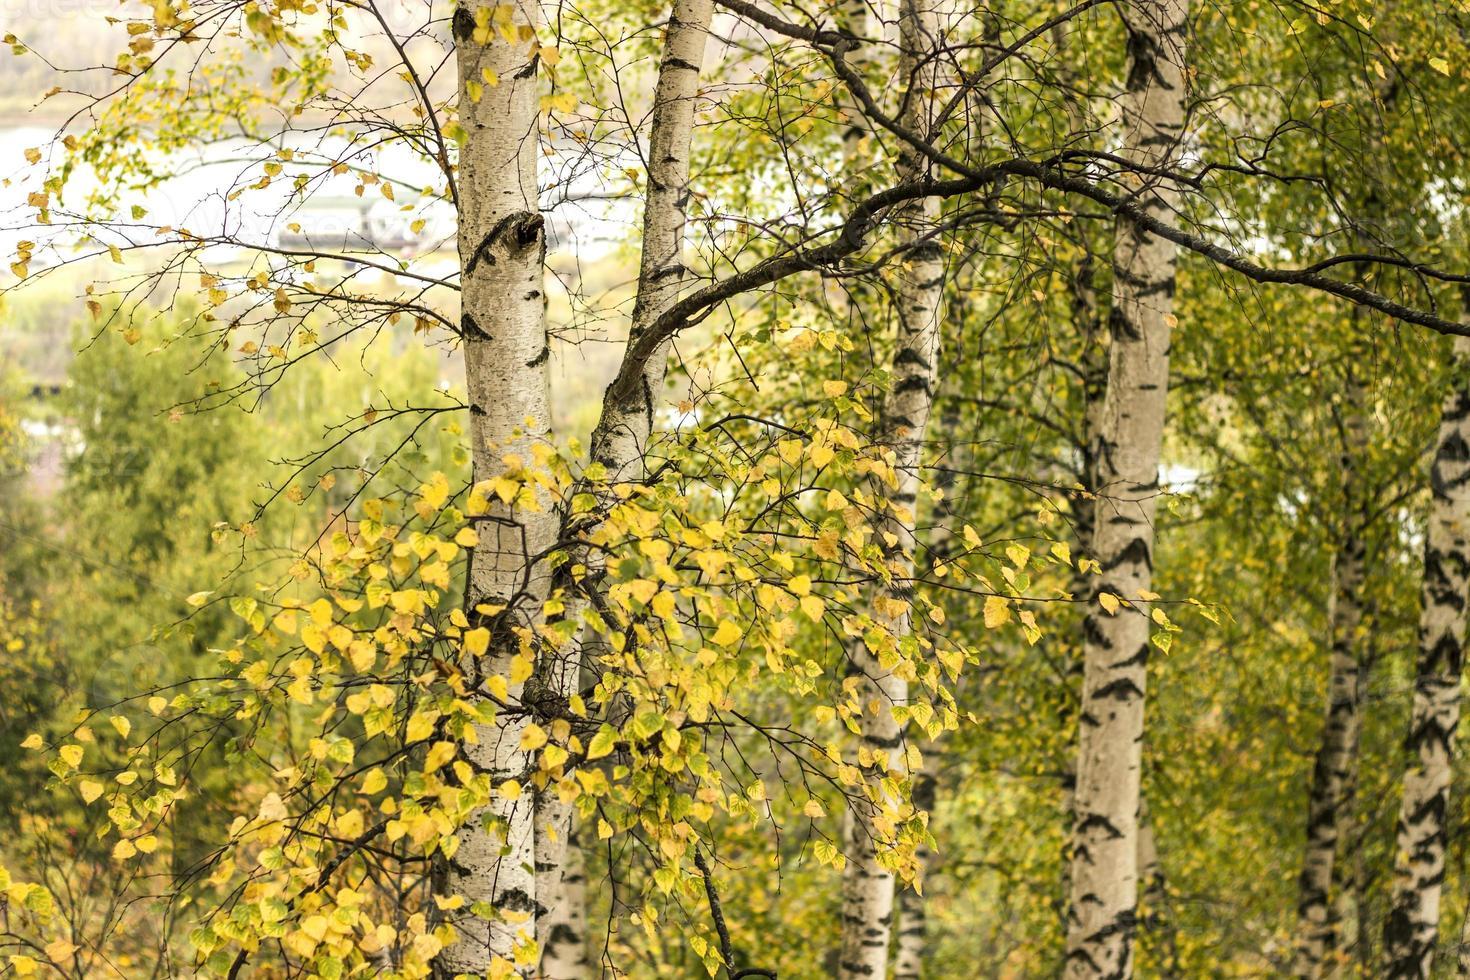 bosque de abedules de otoño foto